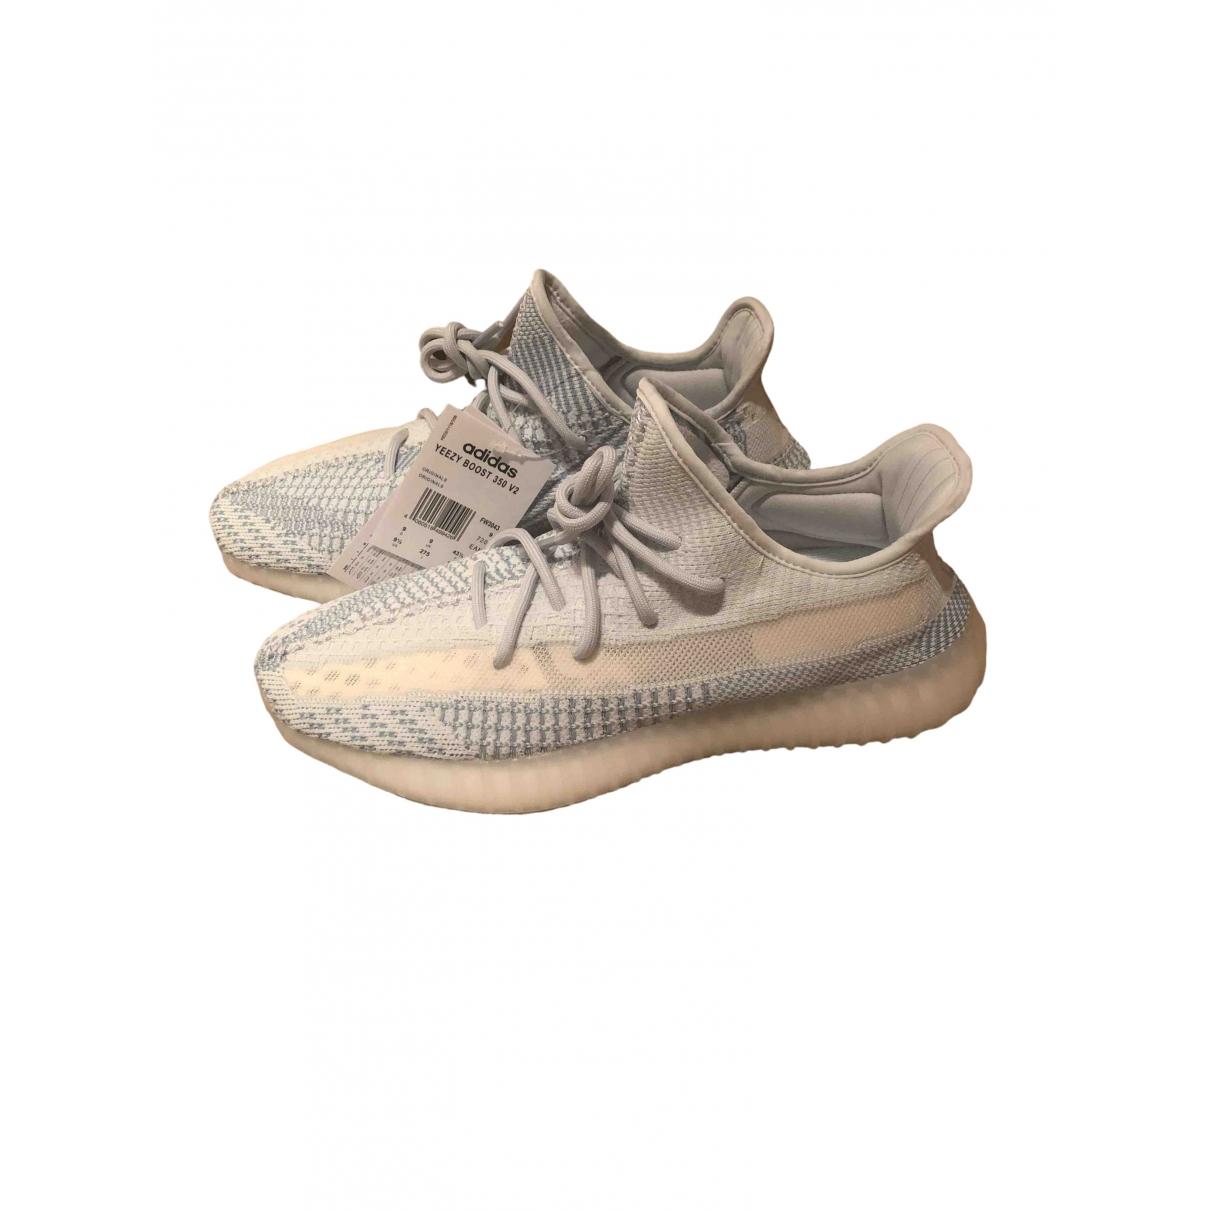 Yeezy X Adidas - Baskets Boost 350 V2 pour homme en toile - bleu